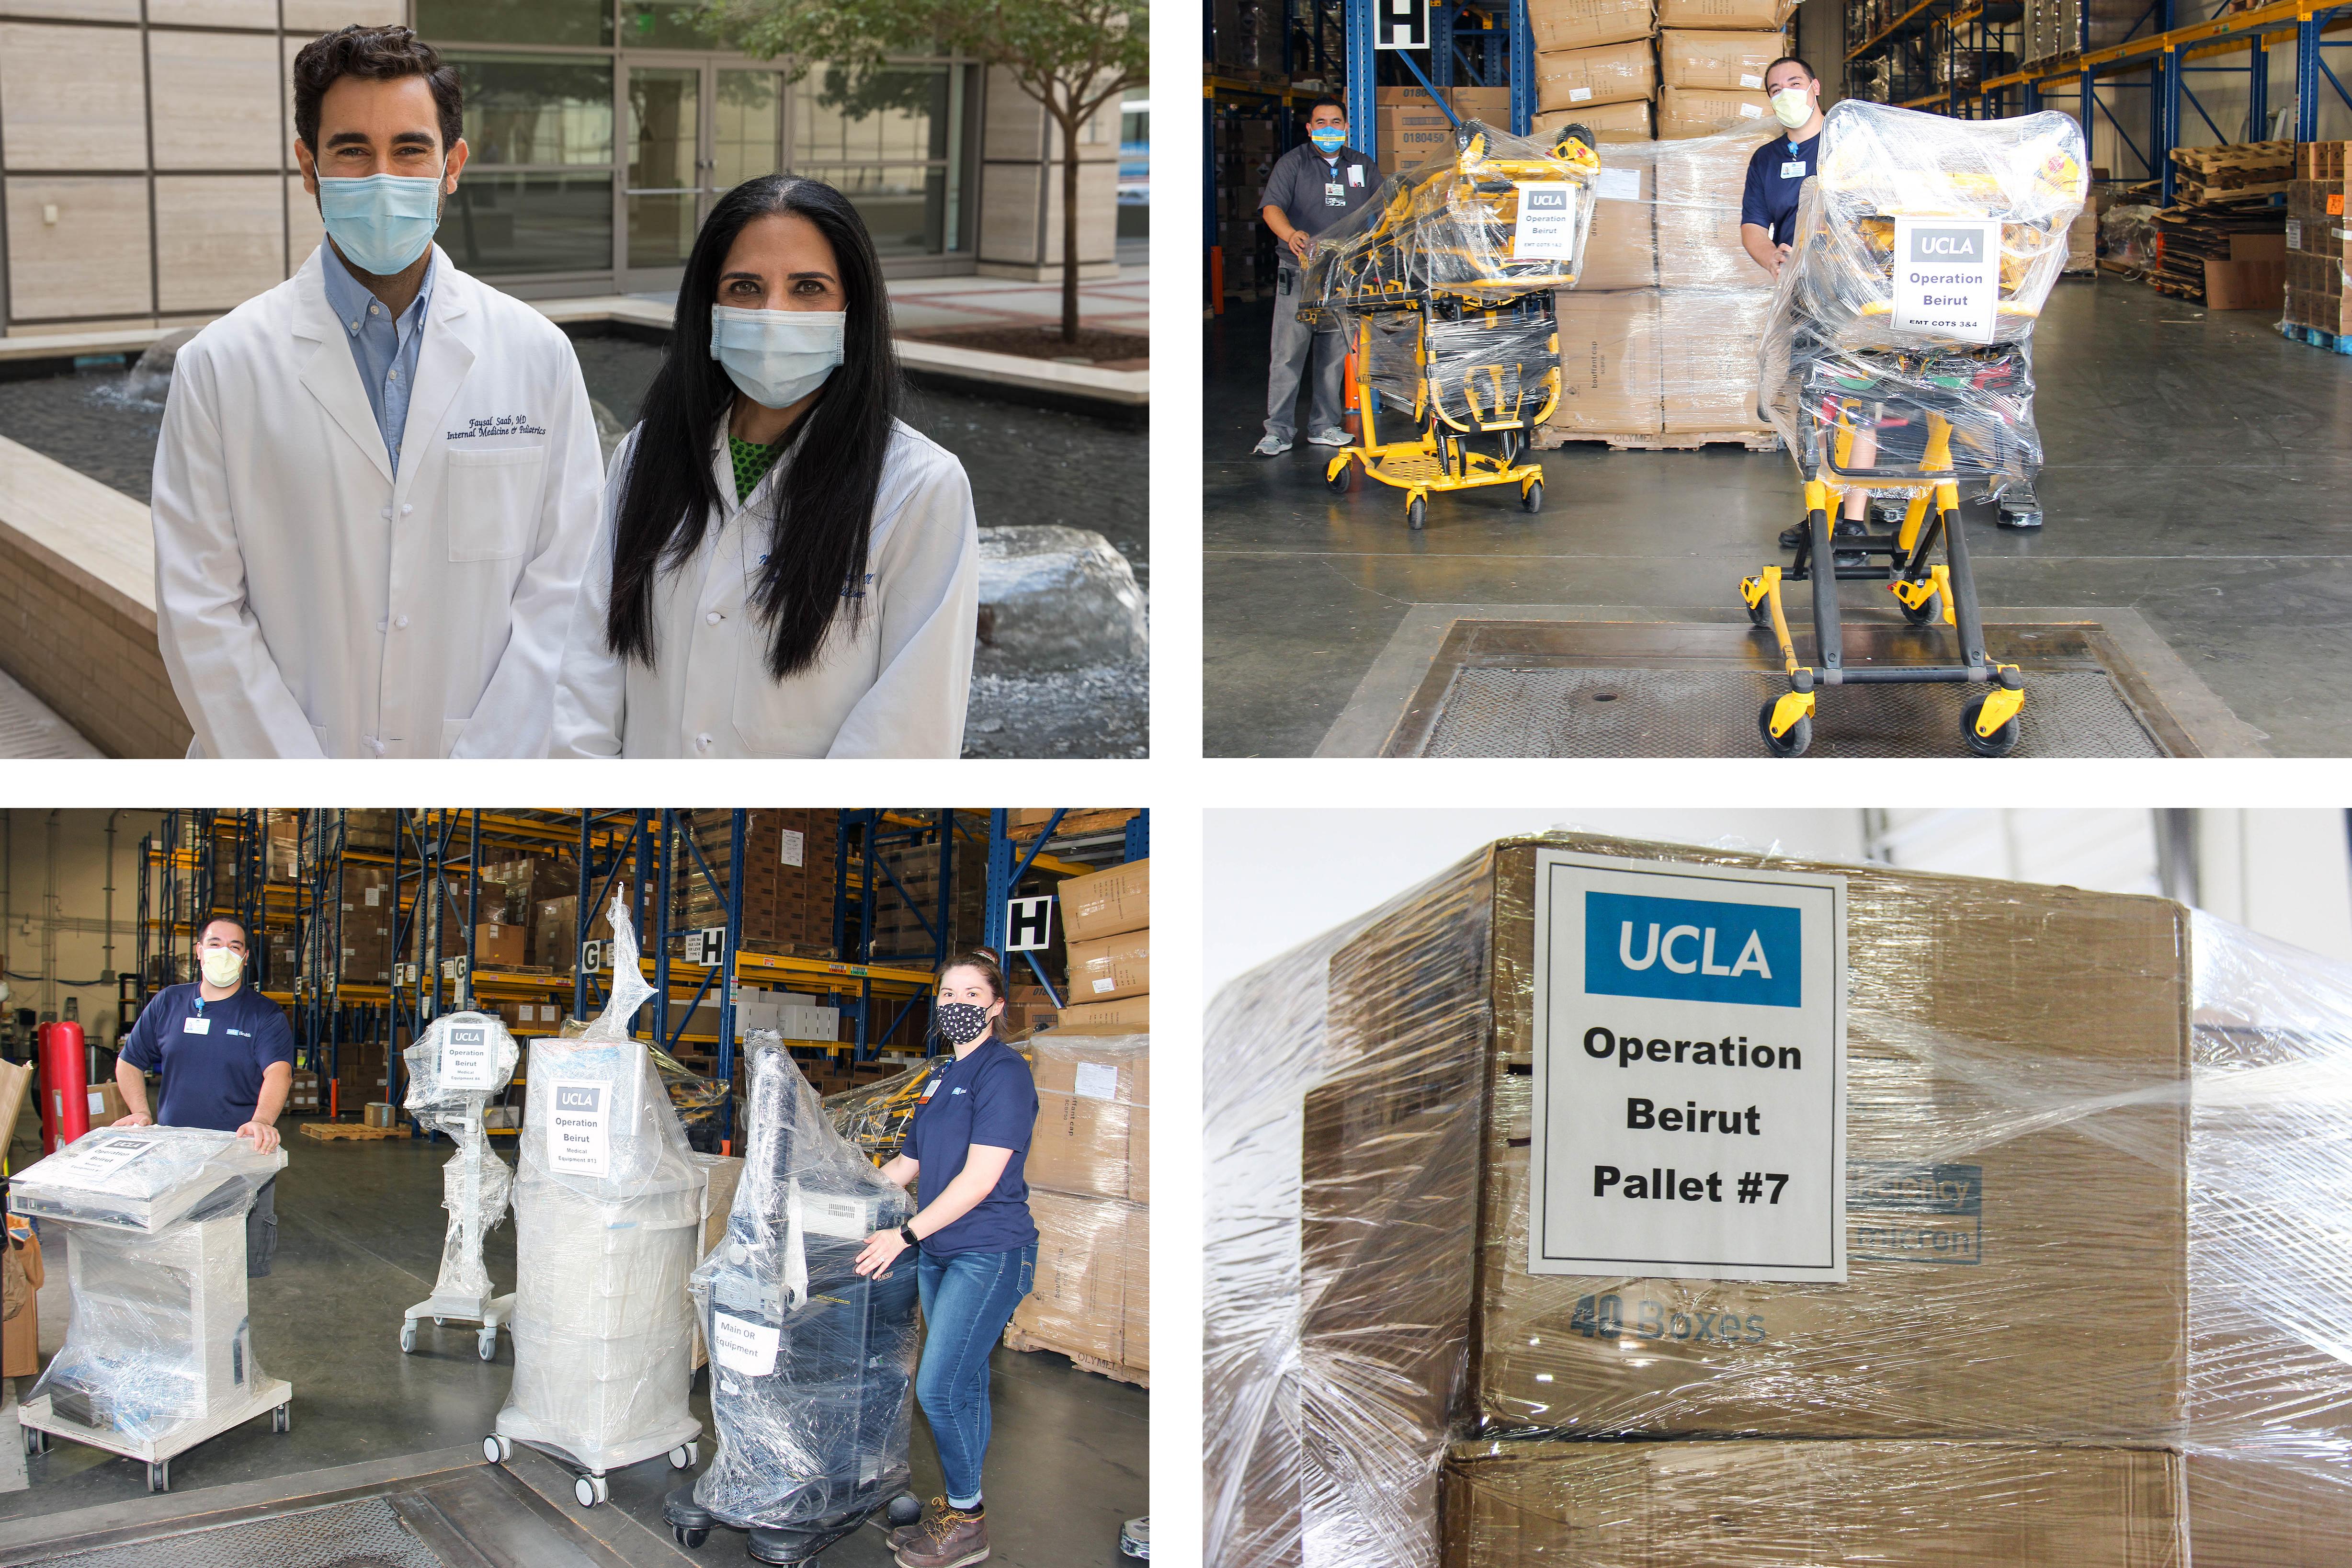 Operation Beiruit humanitarian donations